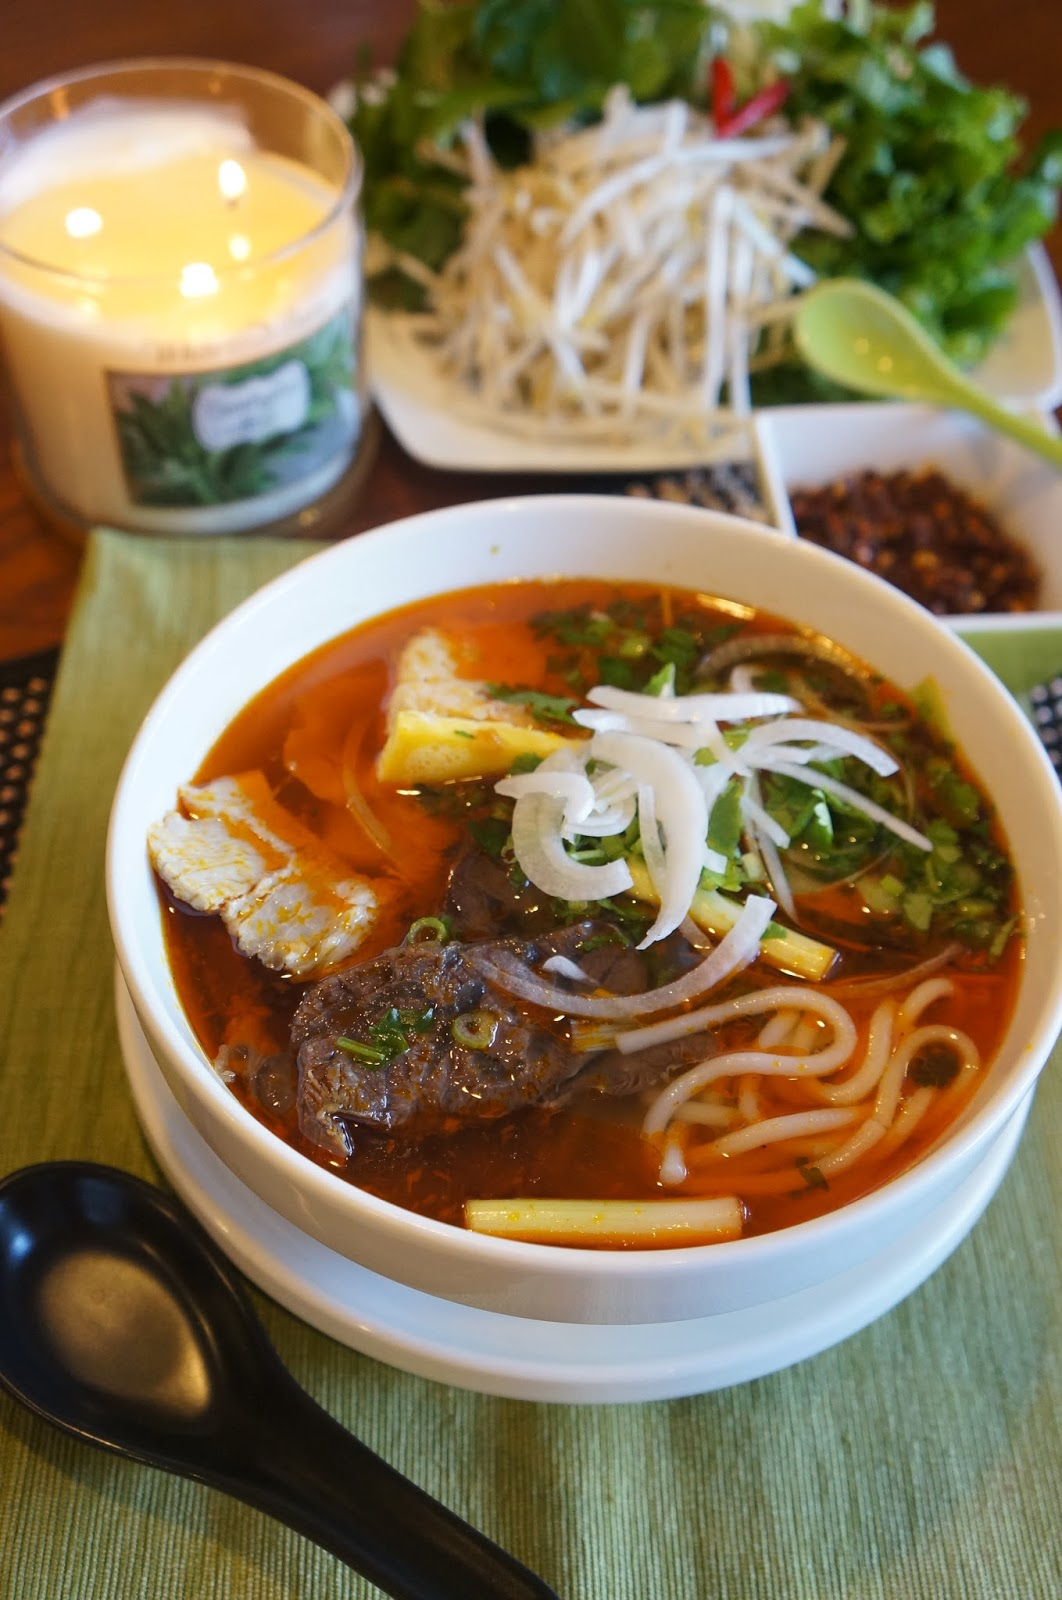 Gourmet by Kat: Bun Bo Hue (Hue style spicy Beef noodle)